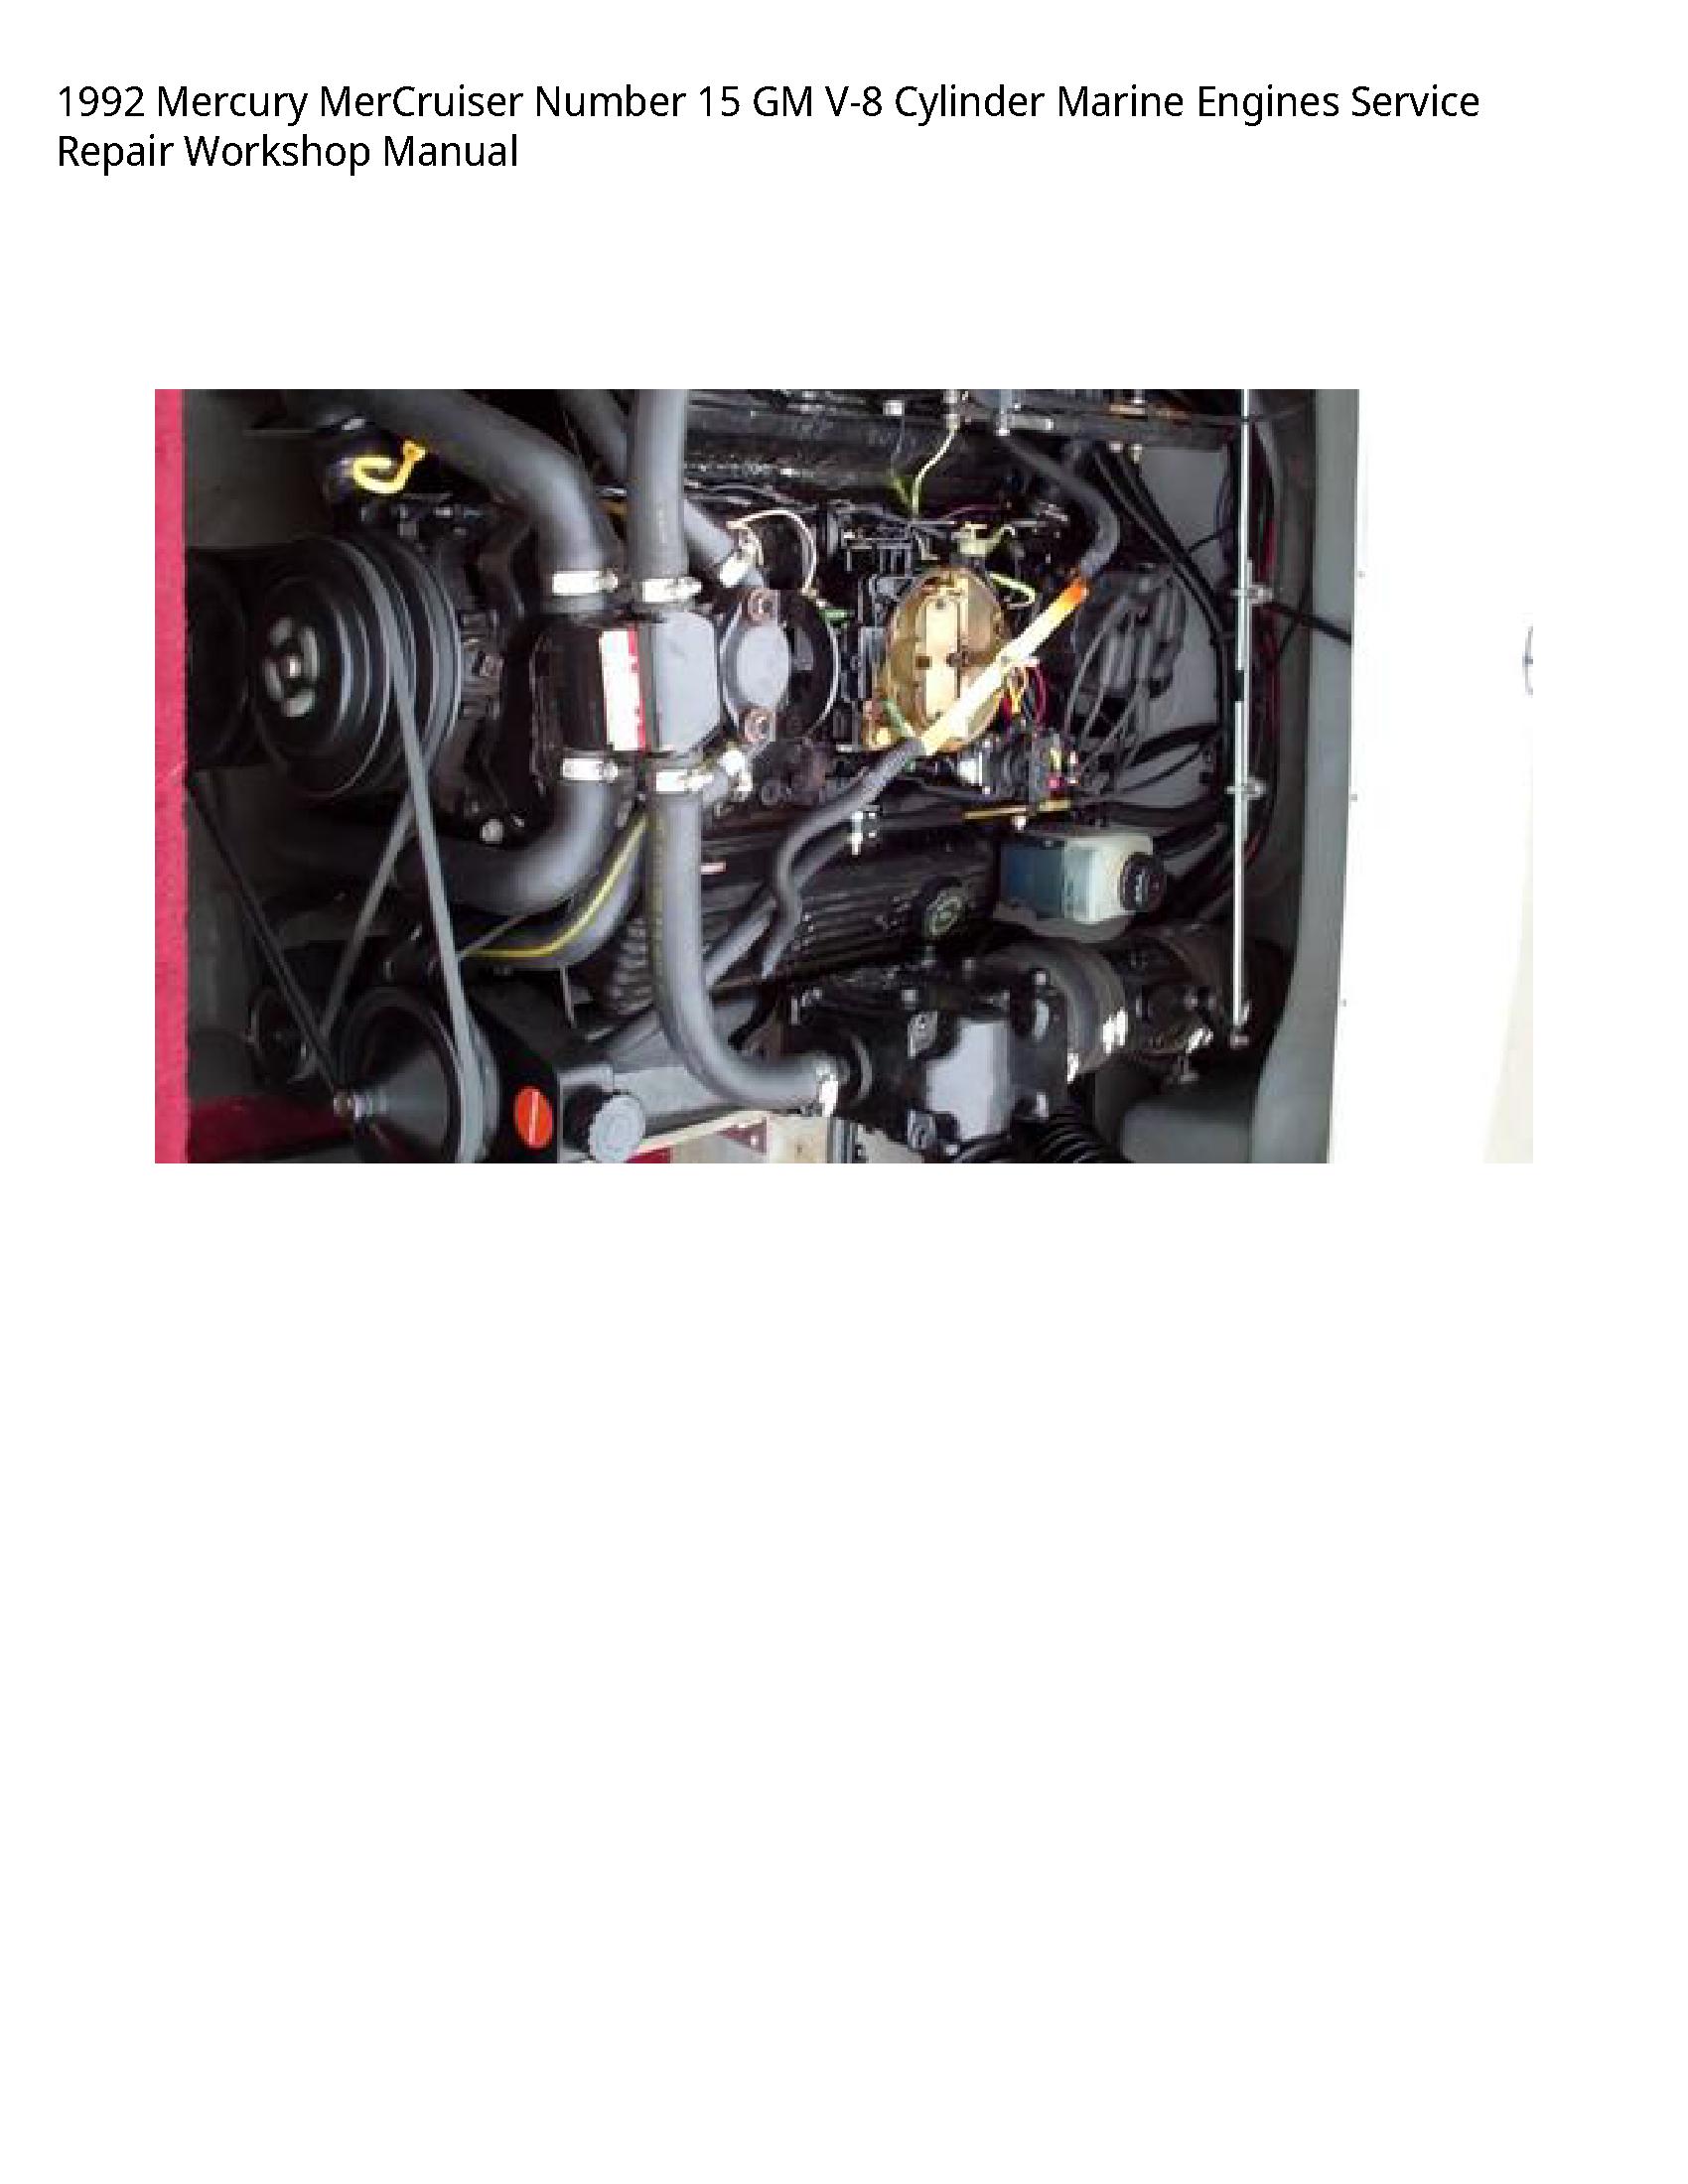 Mercury 15 MerCruiser Number GM Cylinder Marine Engines manual